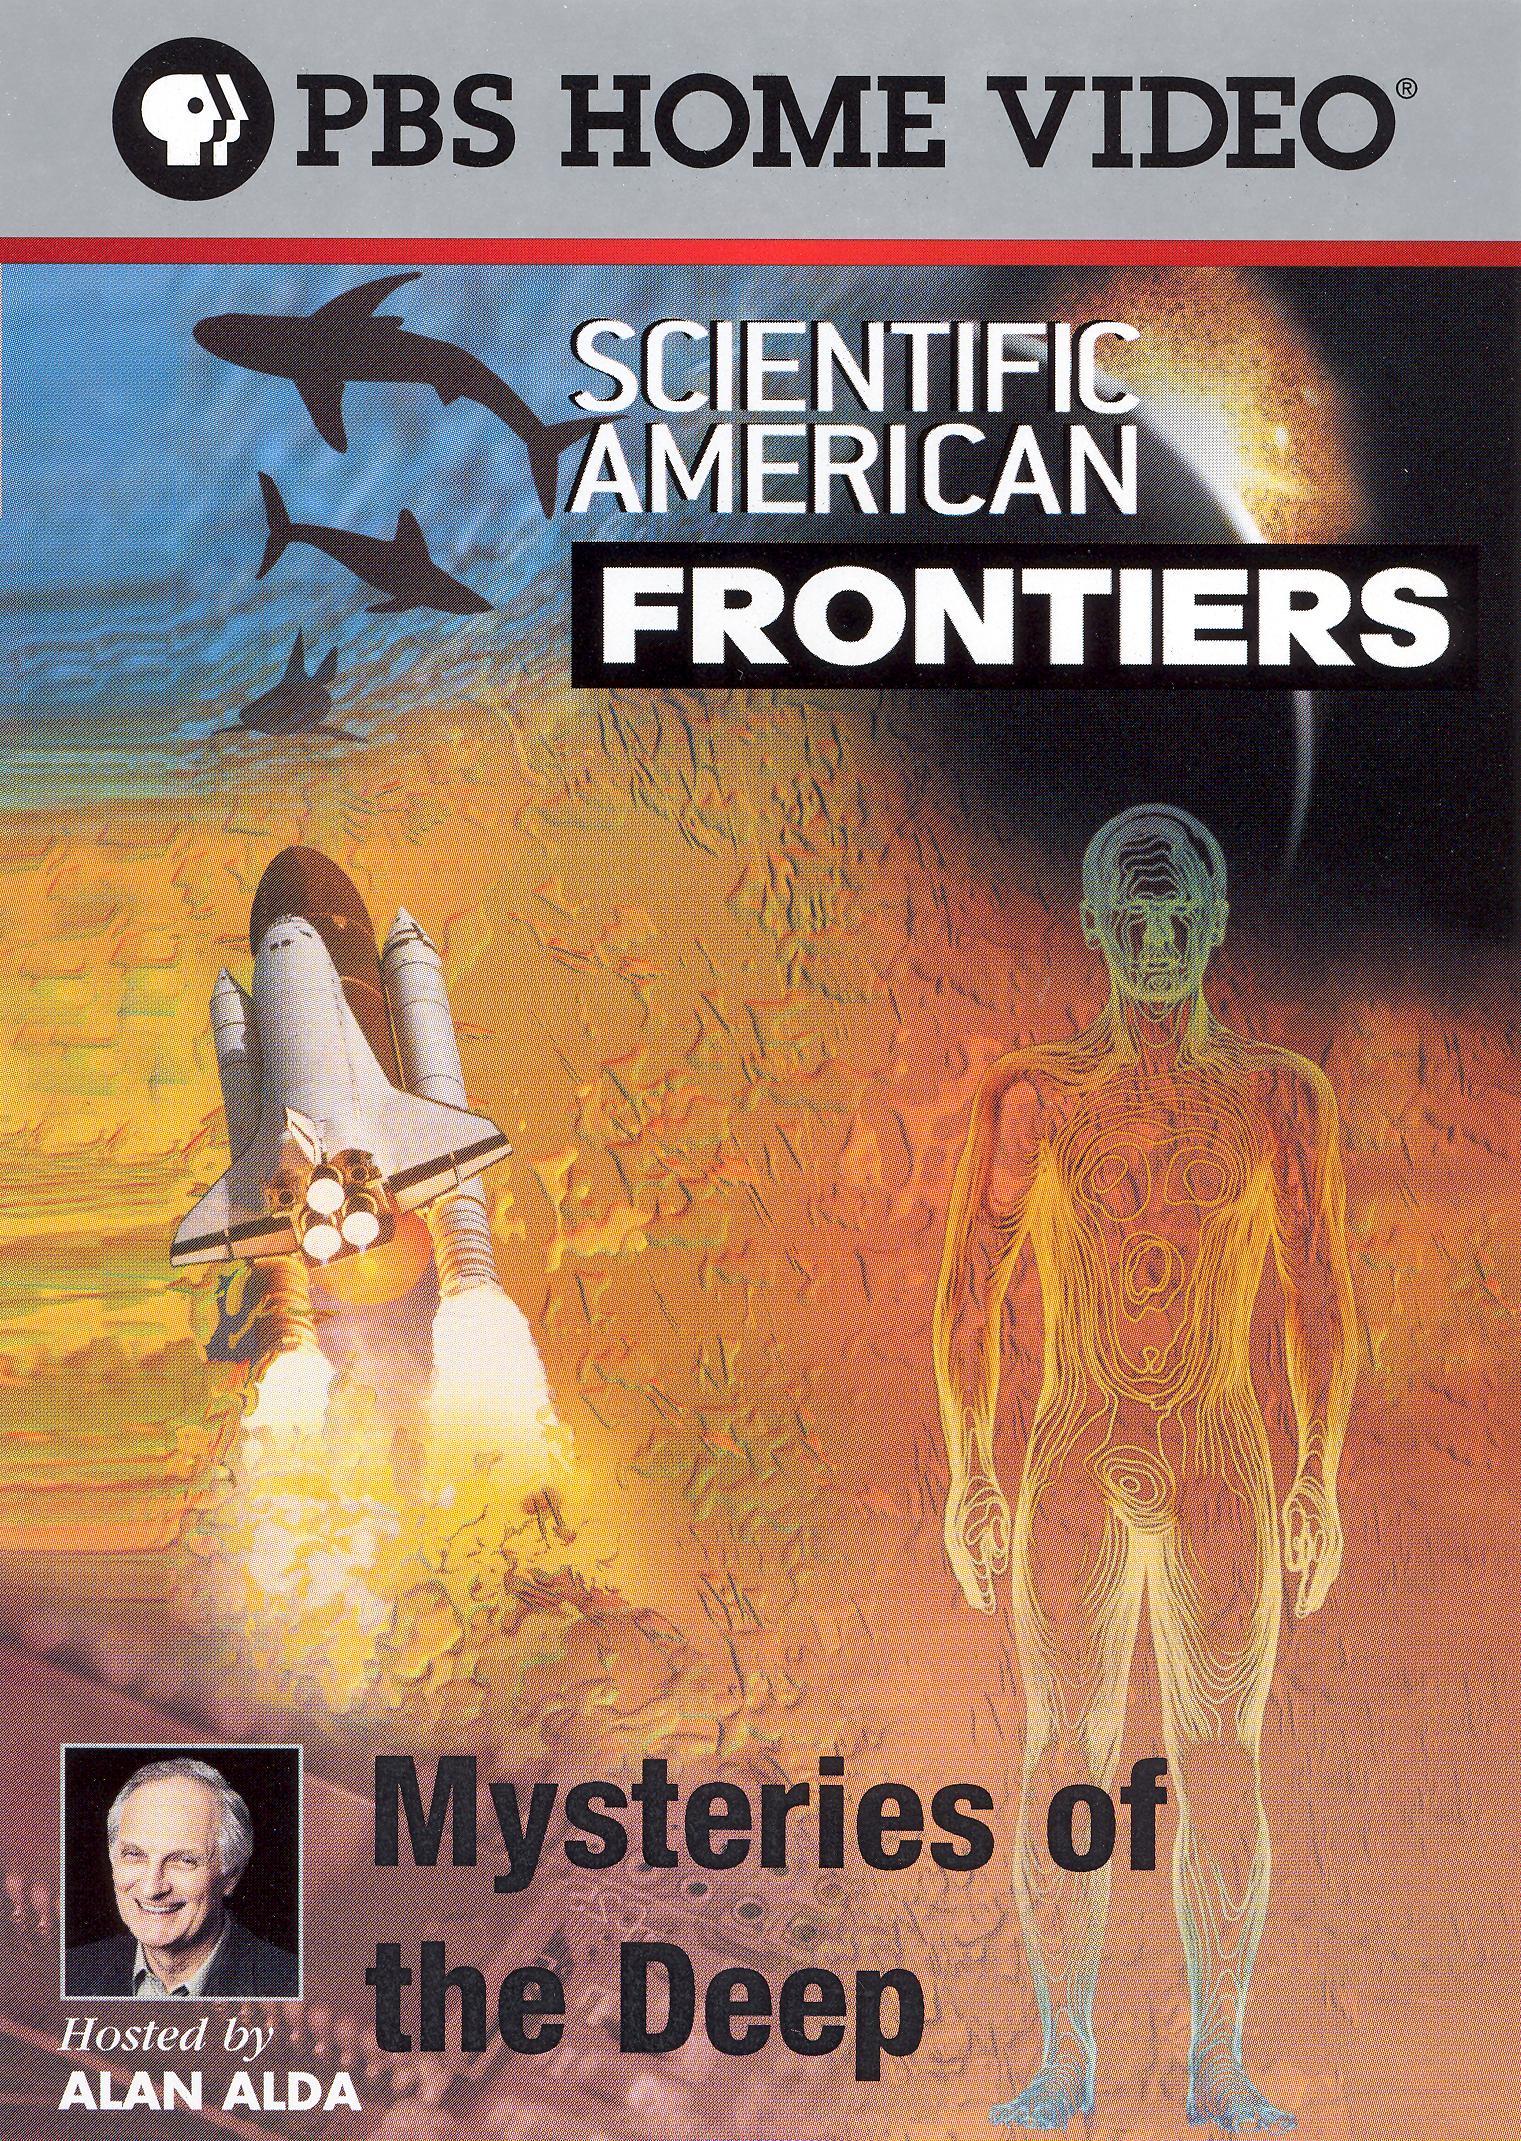 Scientific American Frontiers: Mysteries of the Deep (2002)